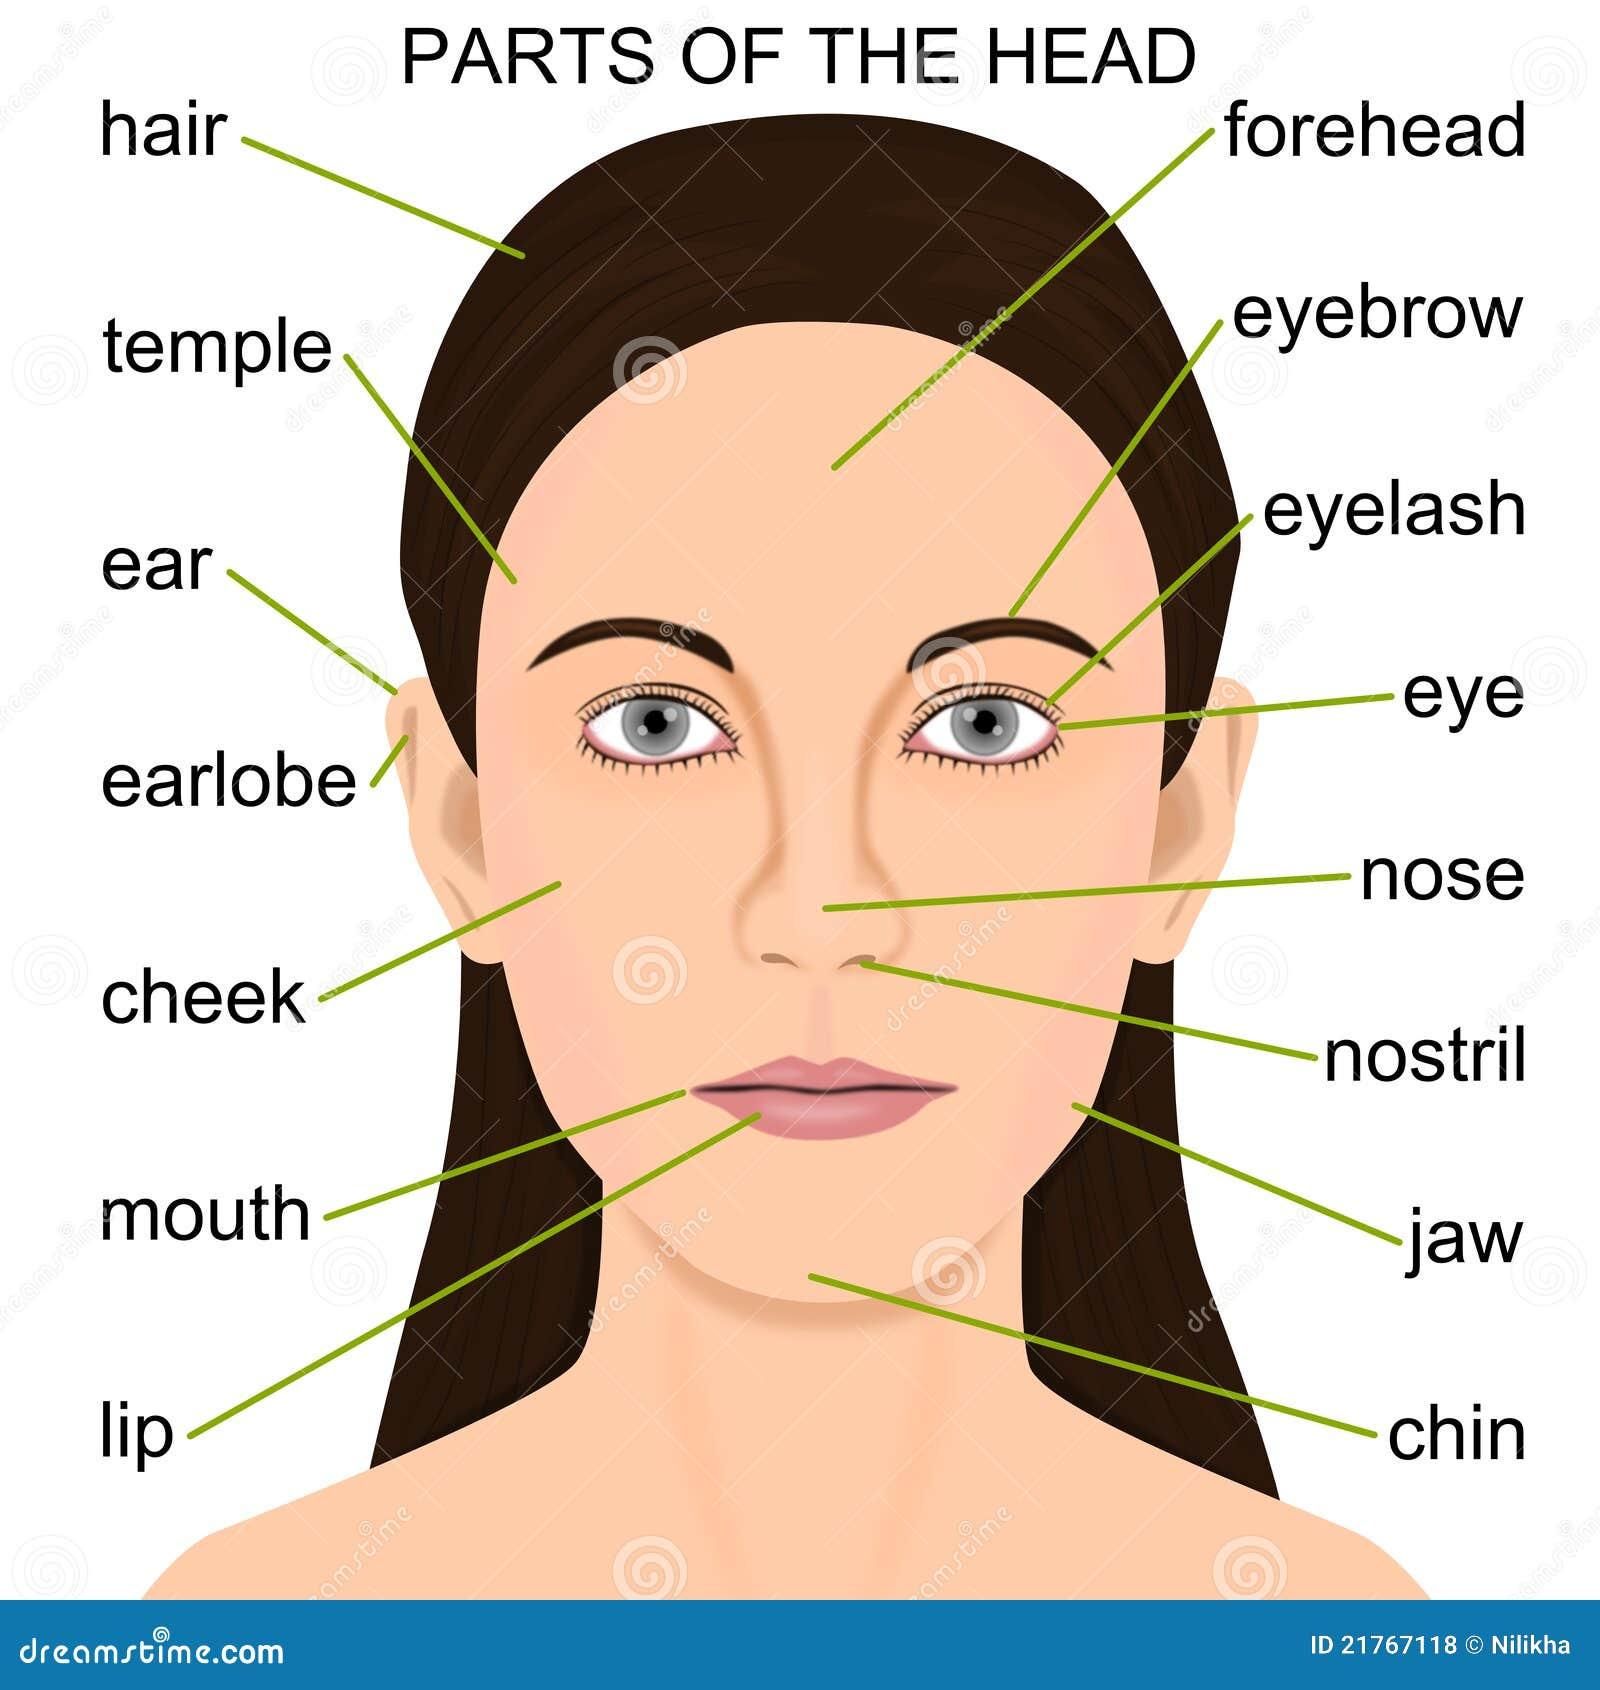 Parts Of The Head Roya...